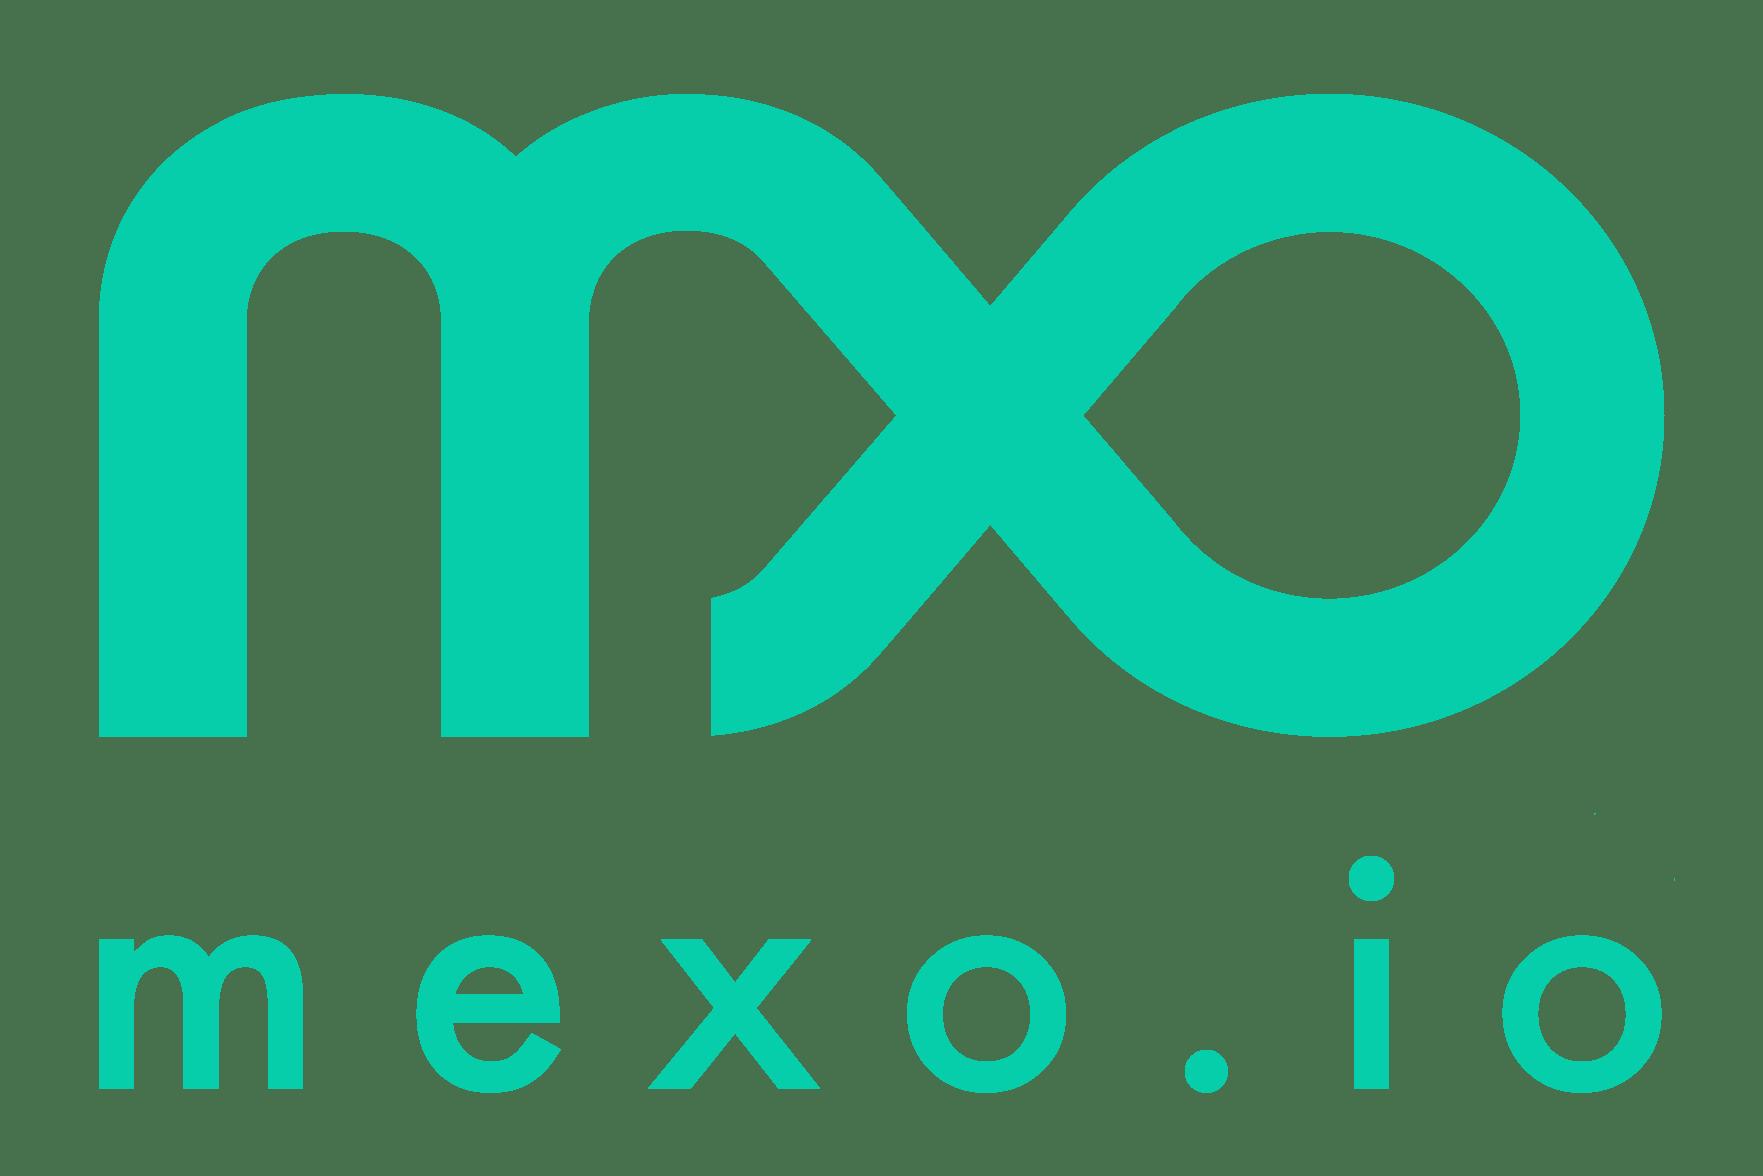 Mexo Exchange logo